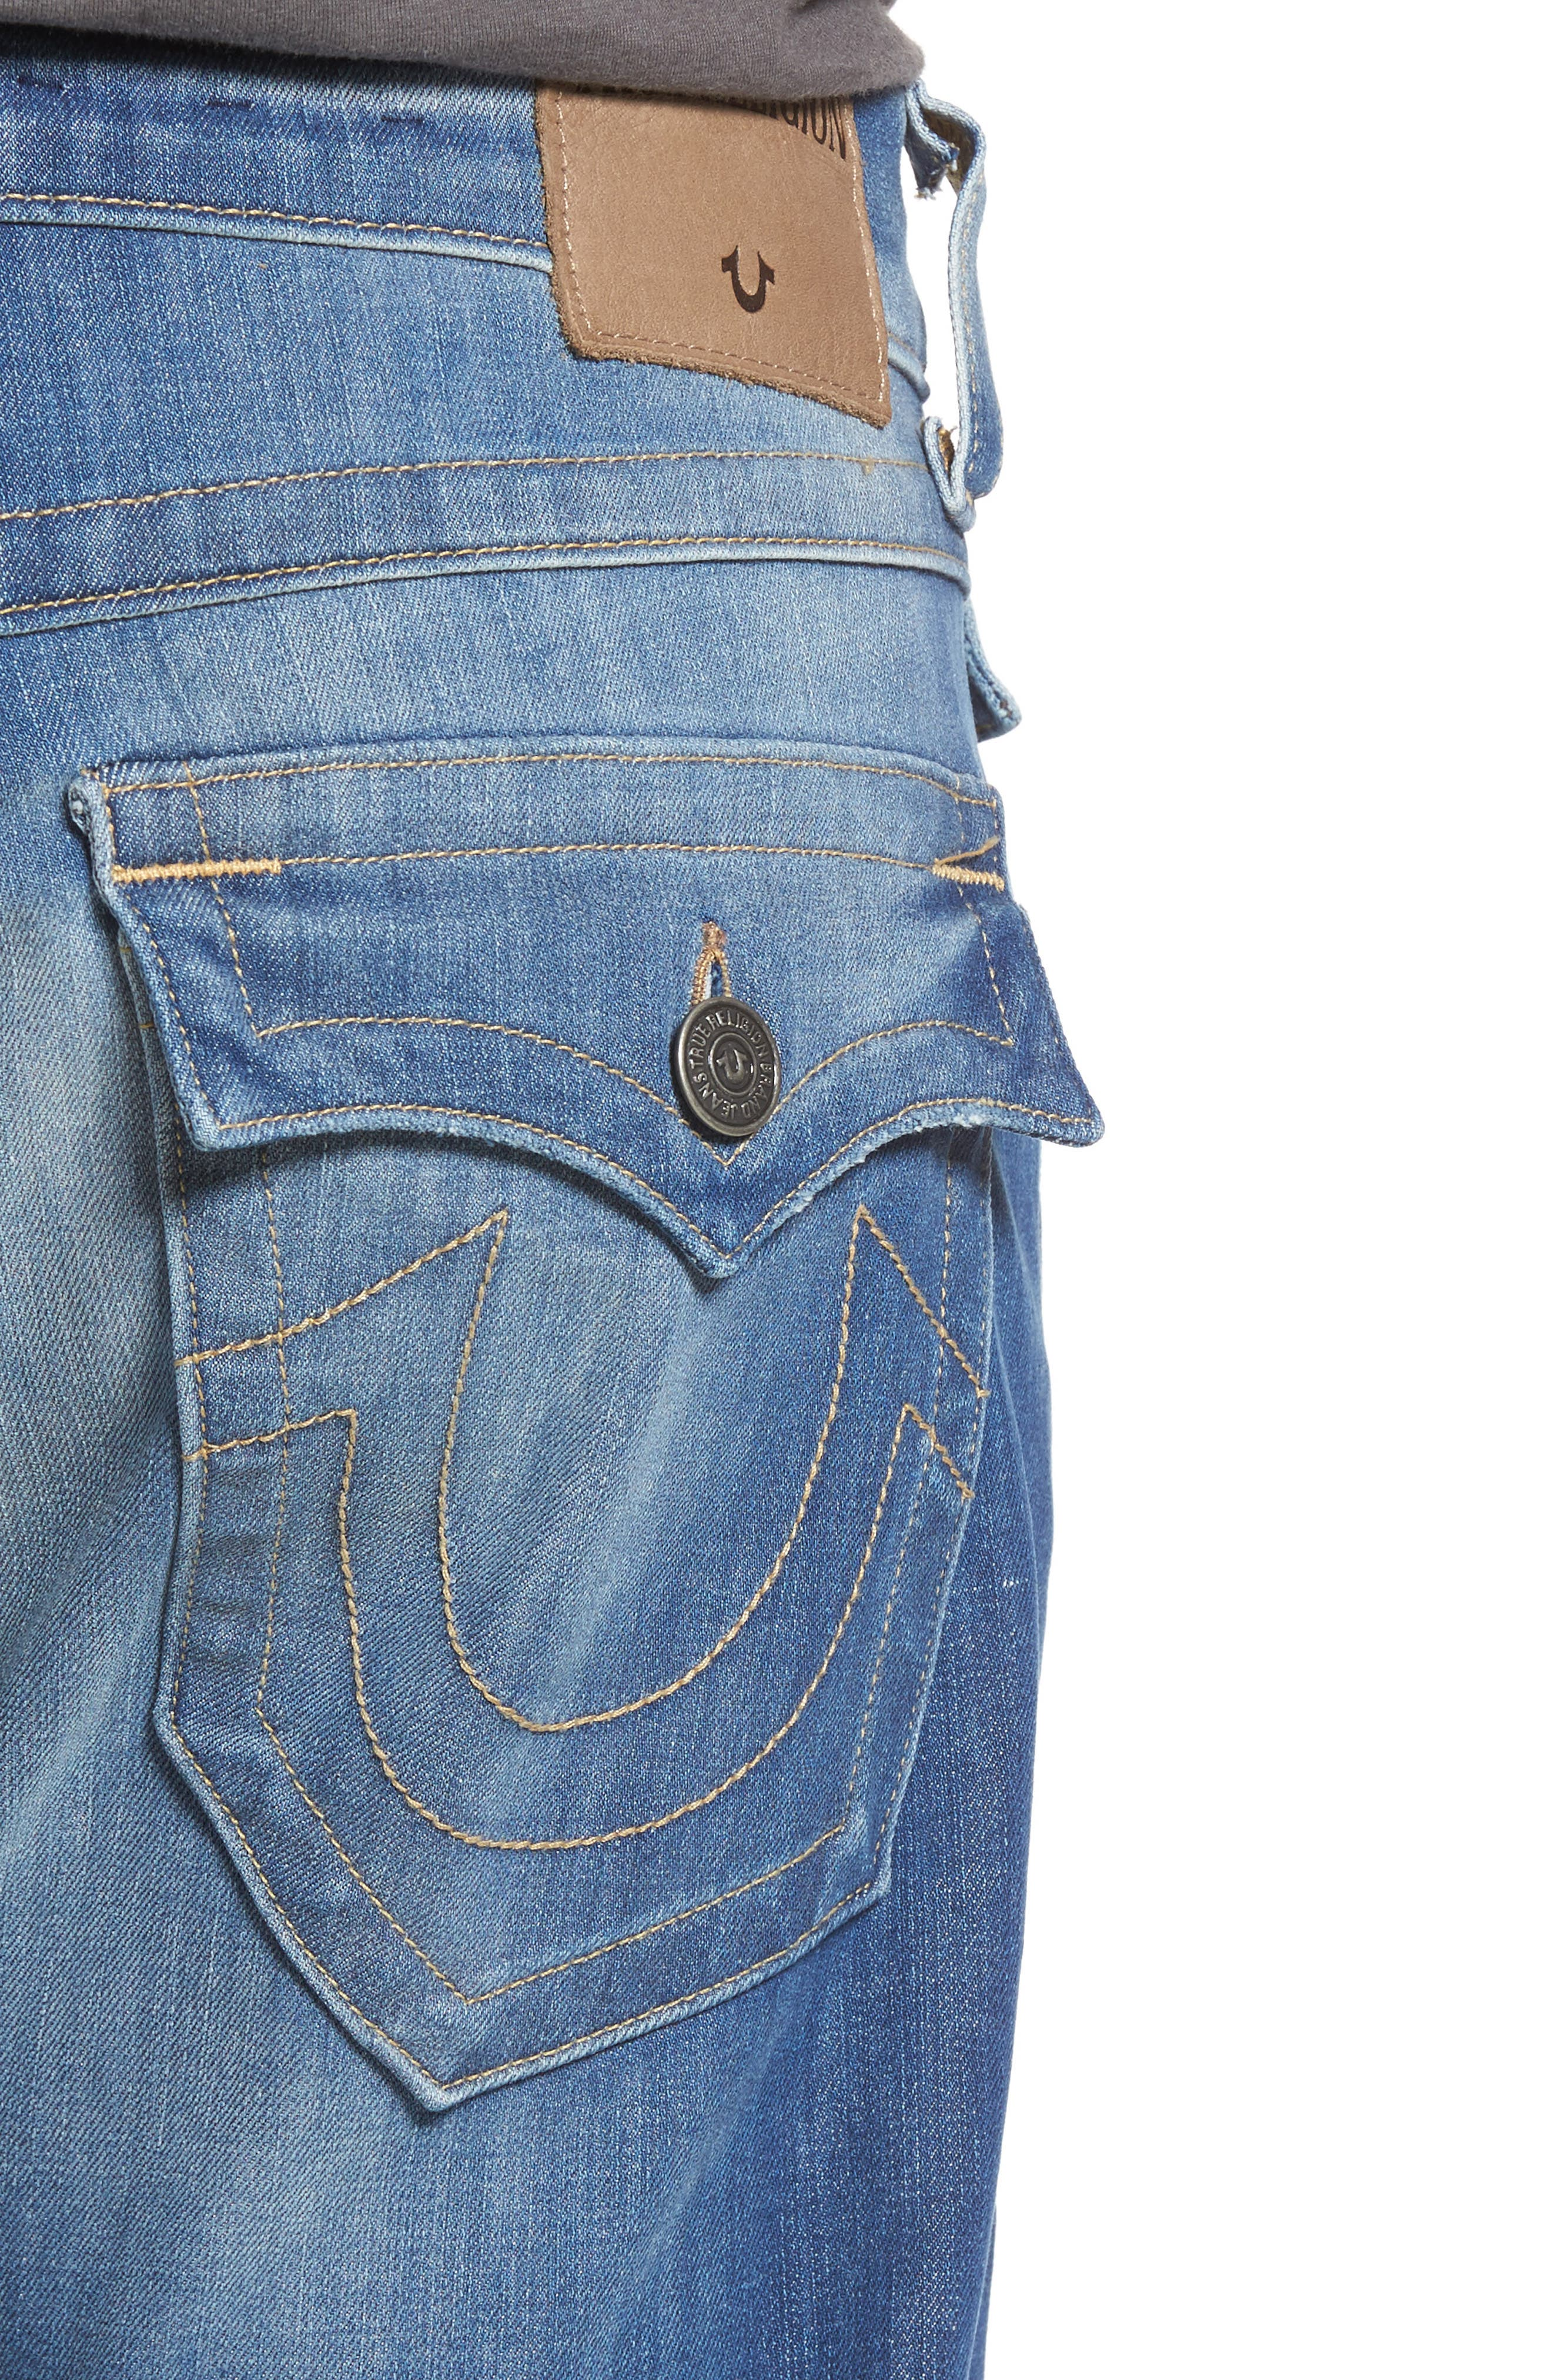 Geno Straight Leg Jeans,                             Alternate thumbnail 4, color,                             400